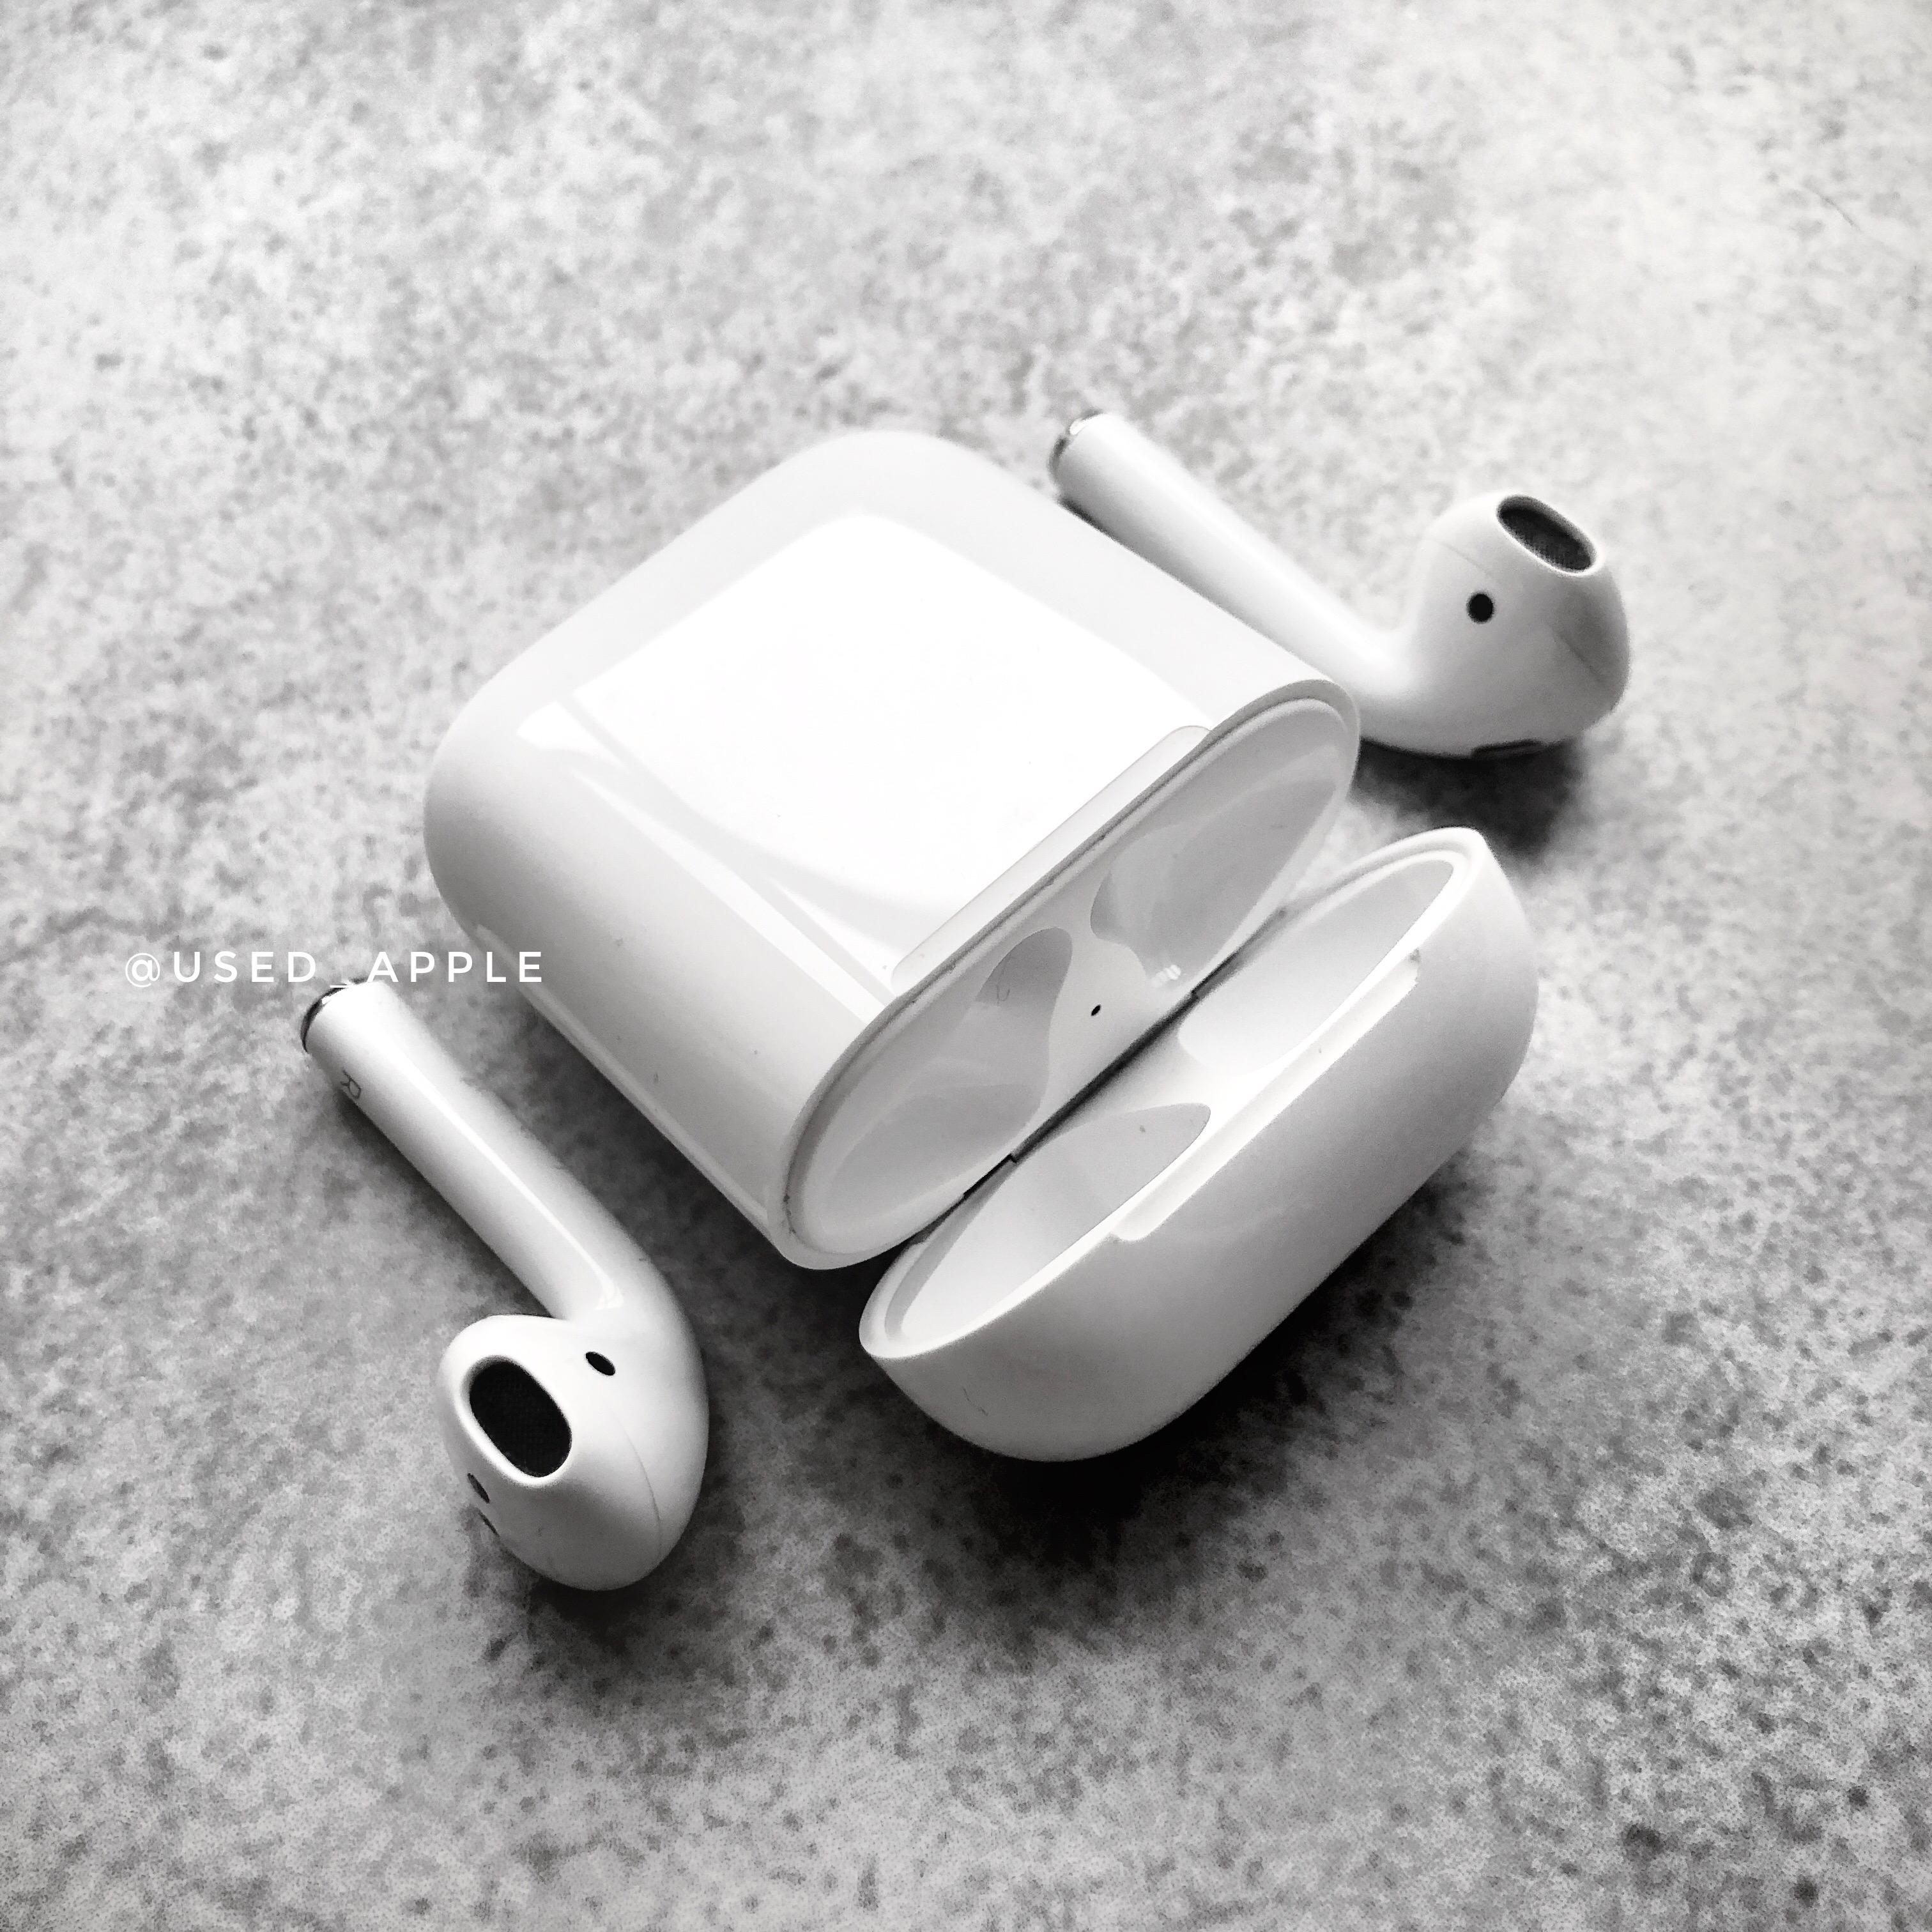 used AirPods вживані бу айфон